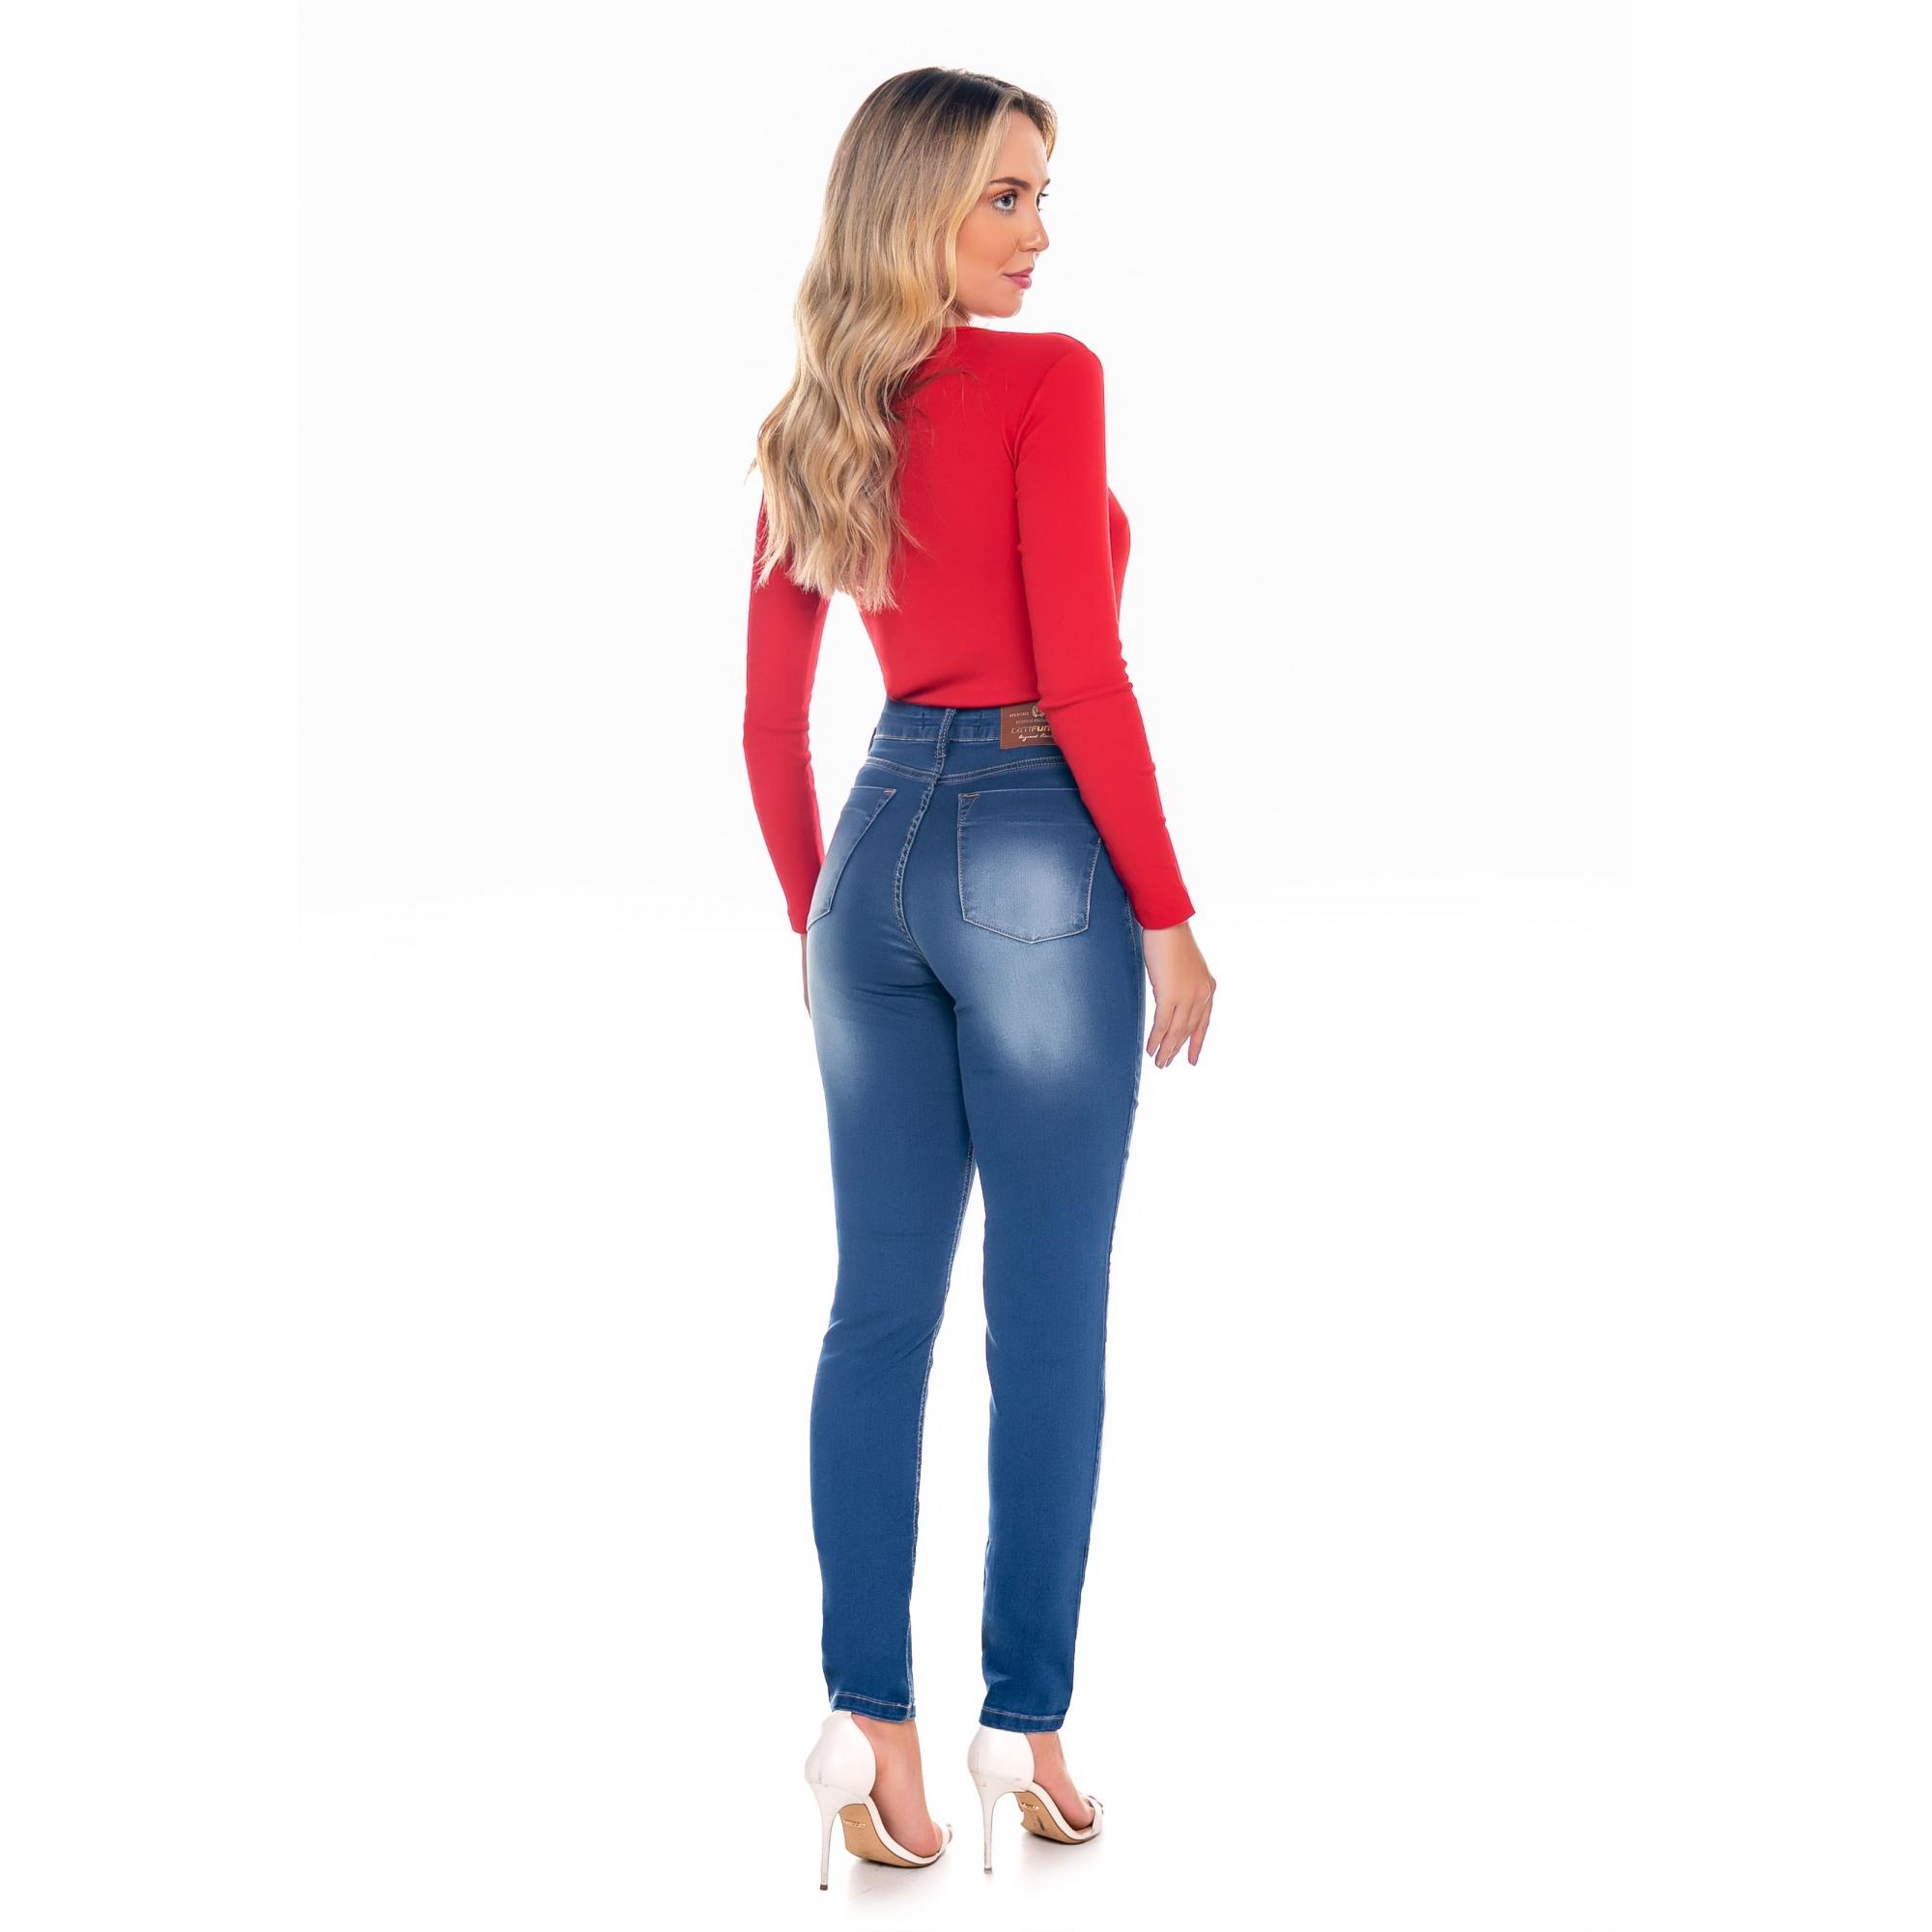 Calça Skinny Feminina Cintura Alta Latifundio